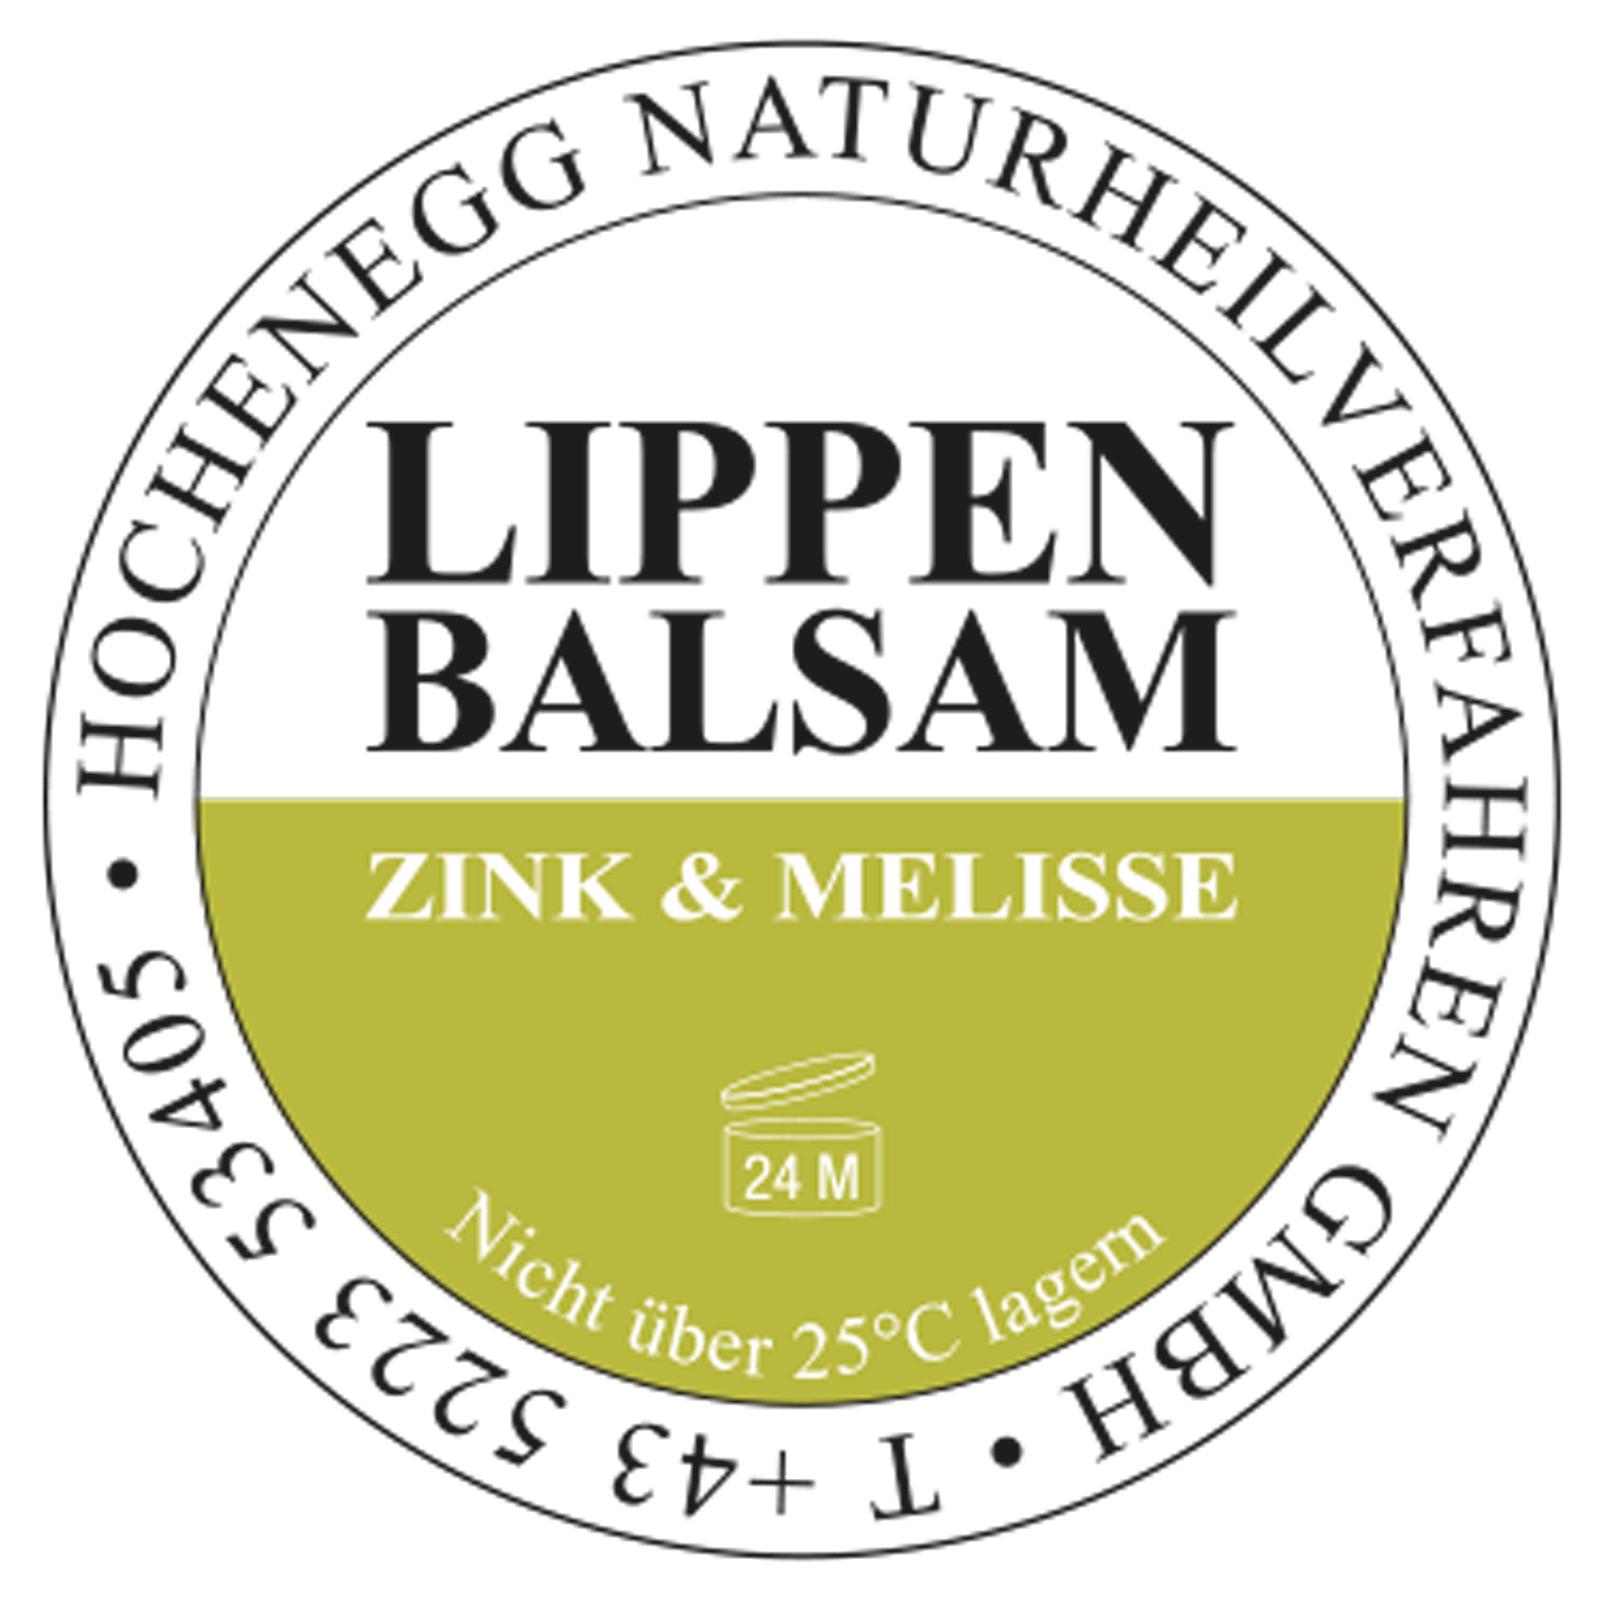 LIPPENBALSAM ZINK & MELISSE (12ml)